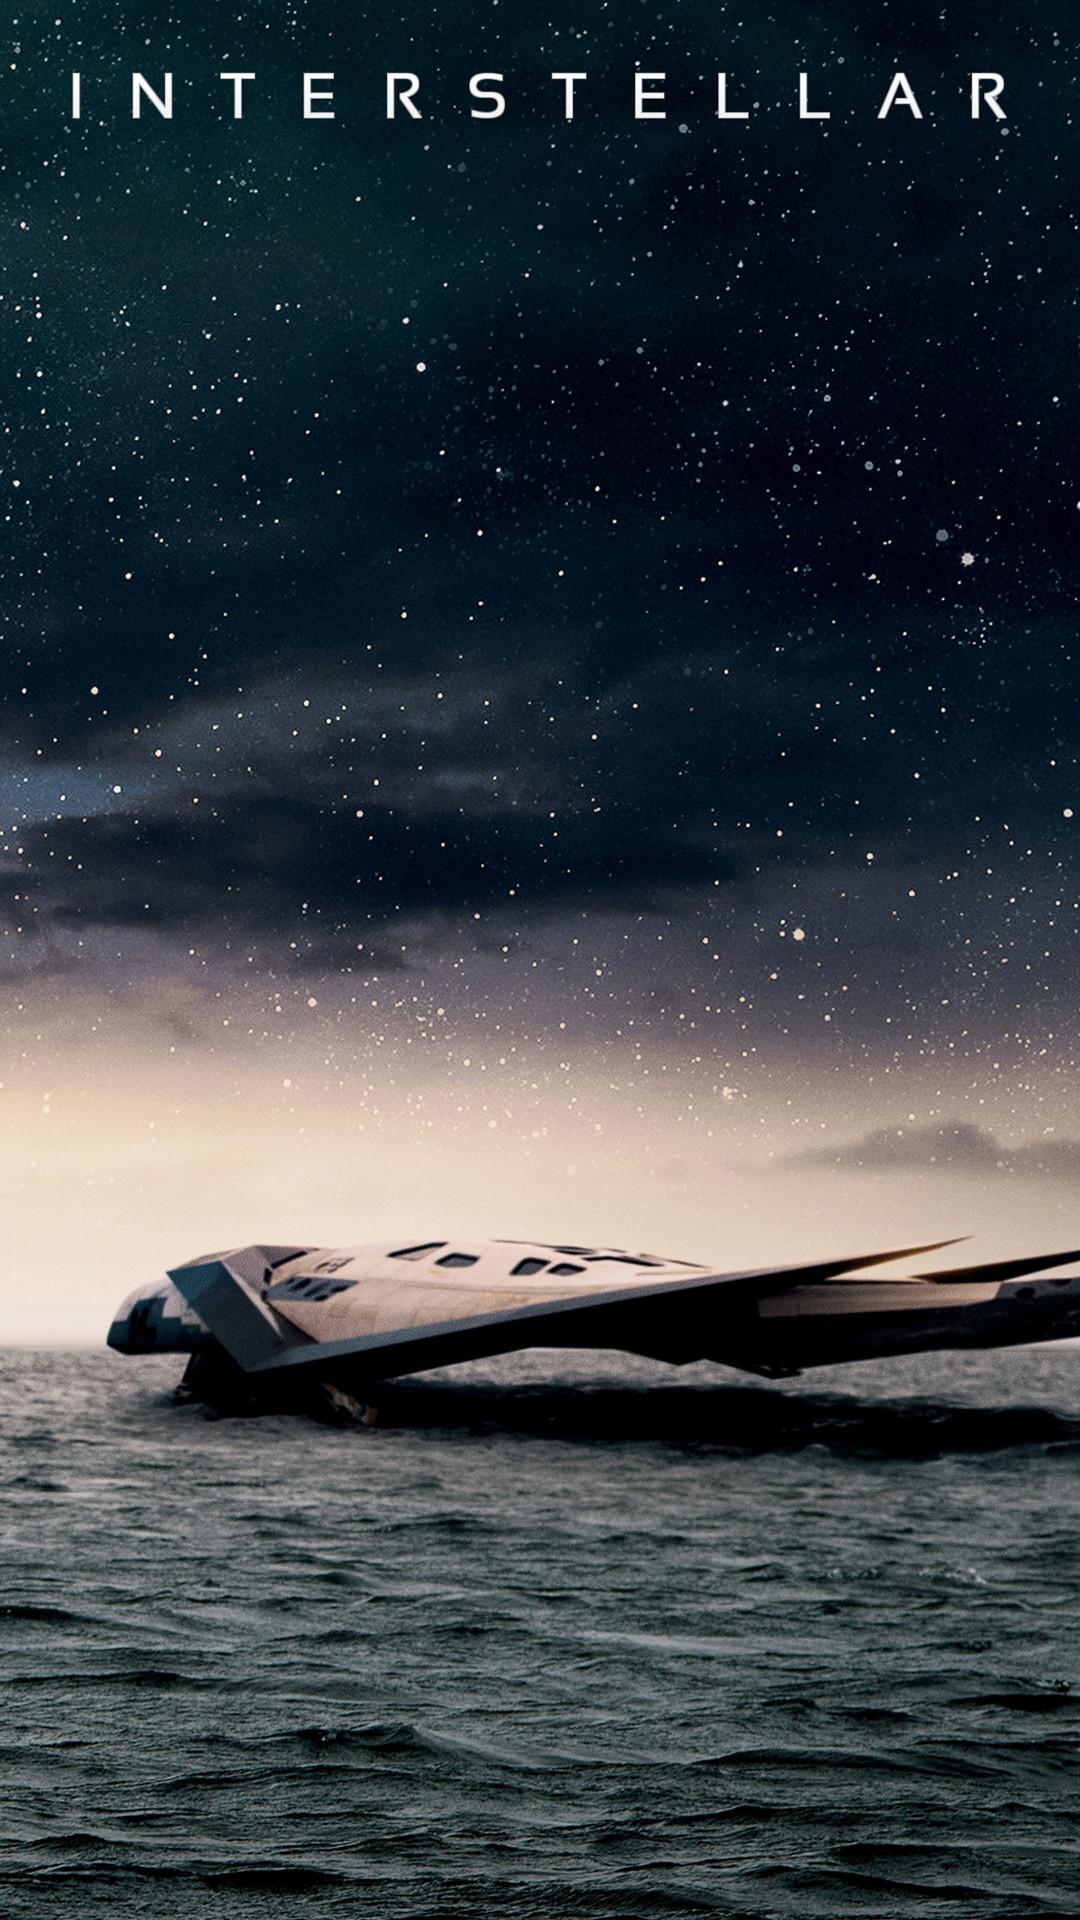 Interstellar wallpaper 80 immagini - 4k love wallpaper for mobile ...